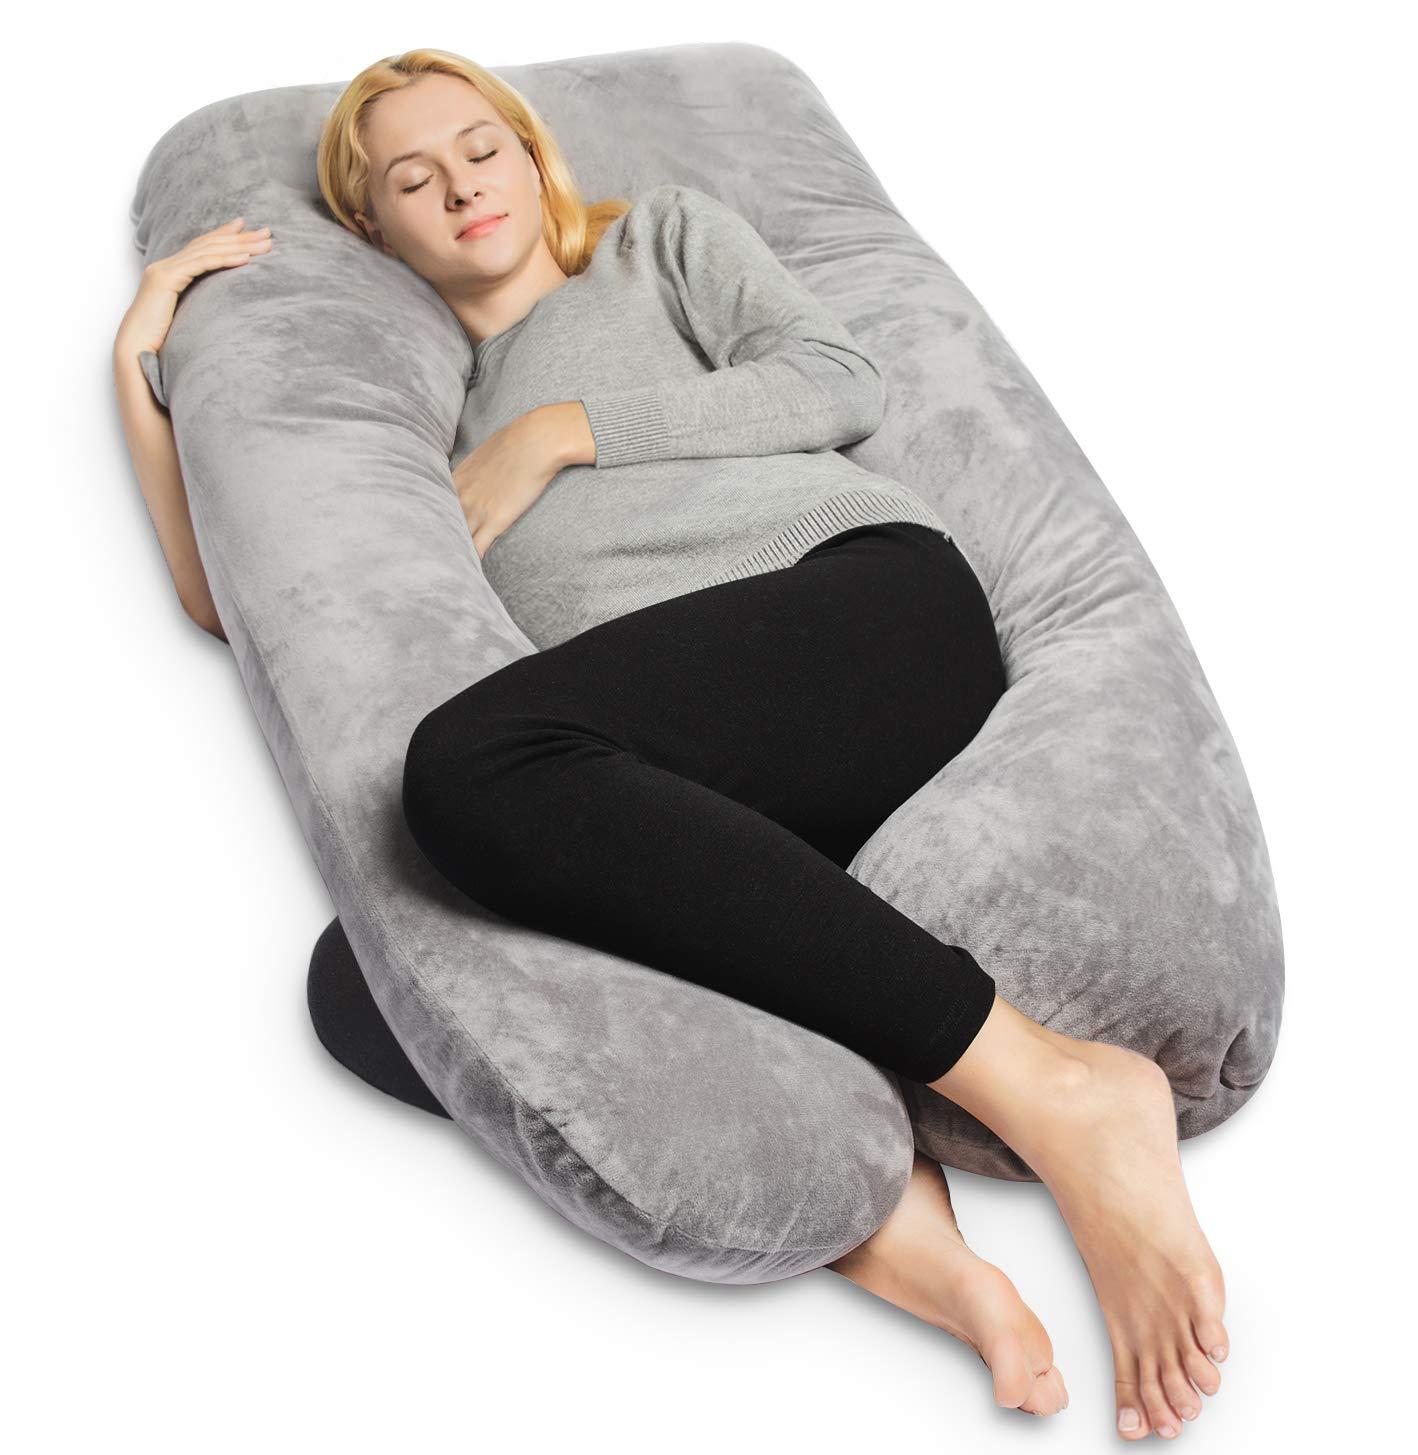 almohada embarazo ripley